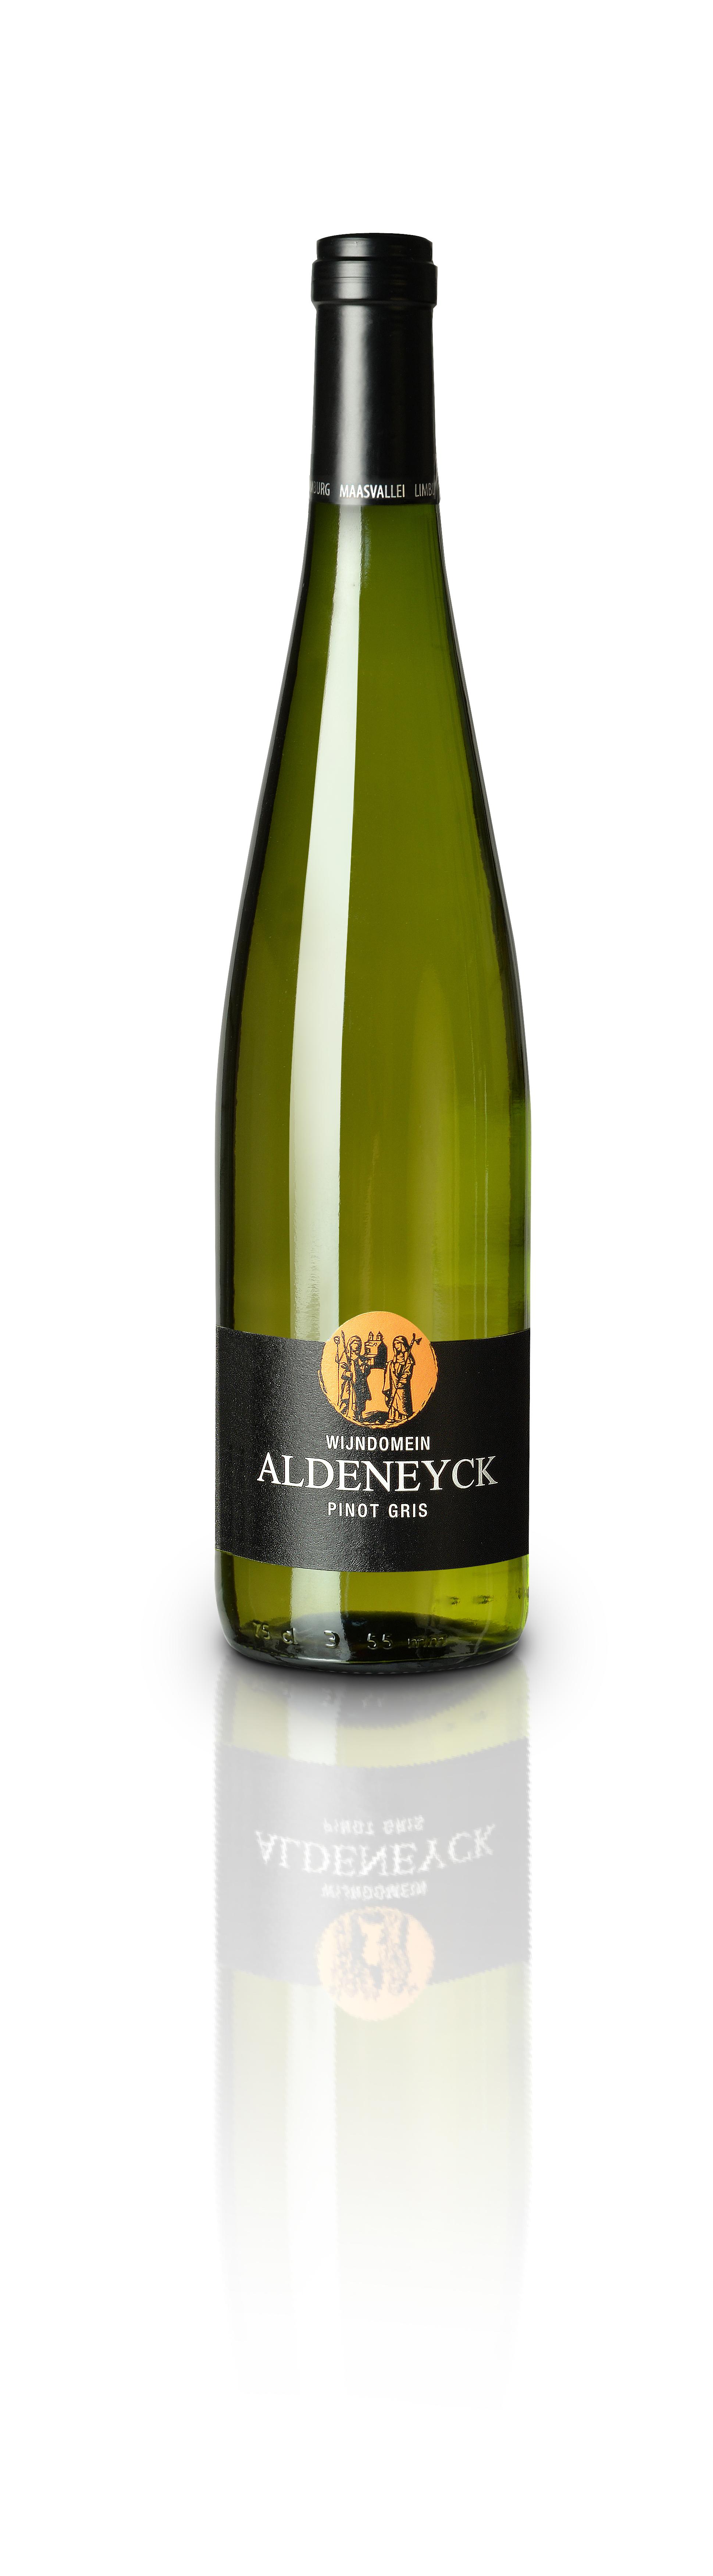 Aldeneyck Pinot Gris